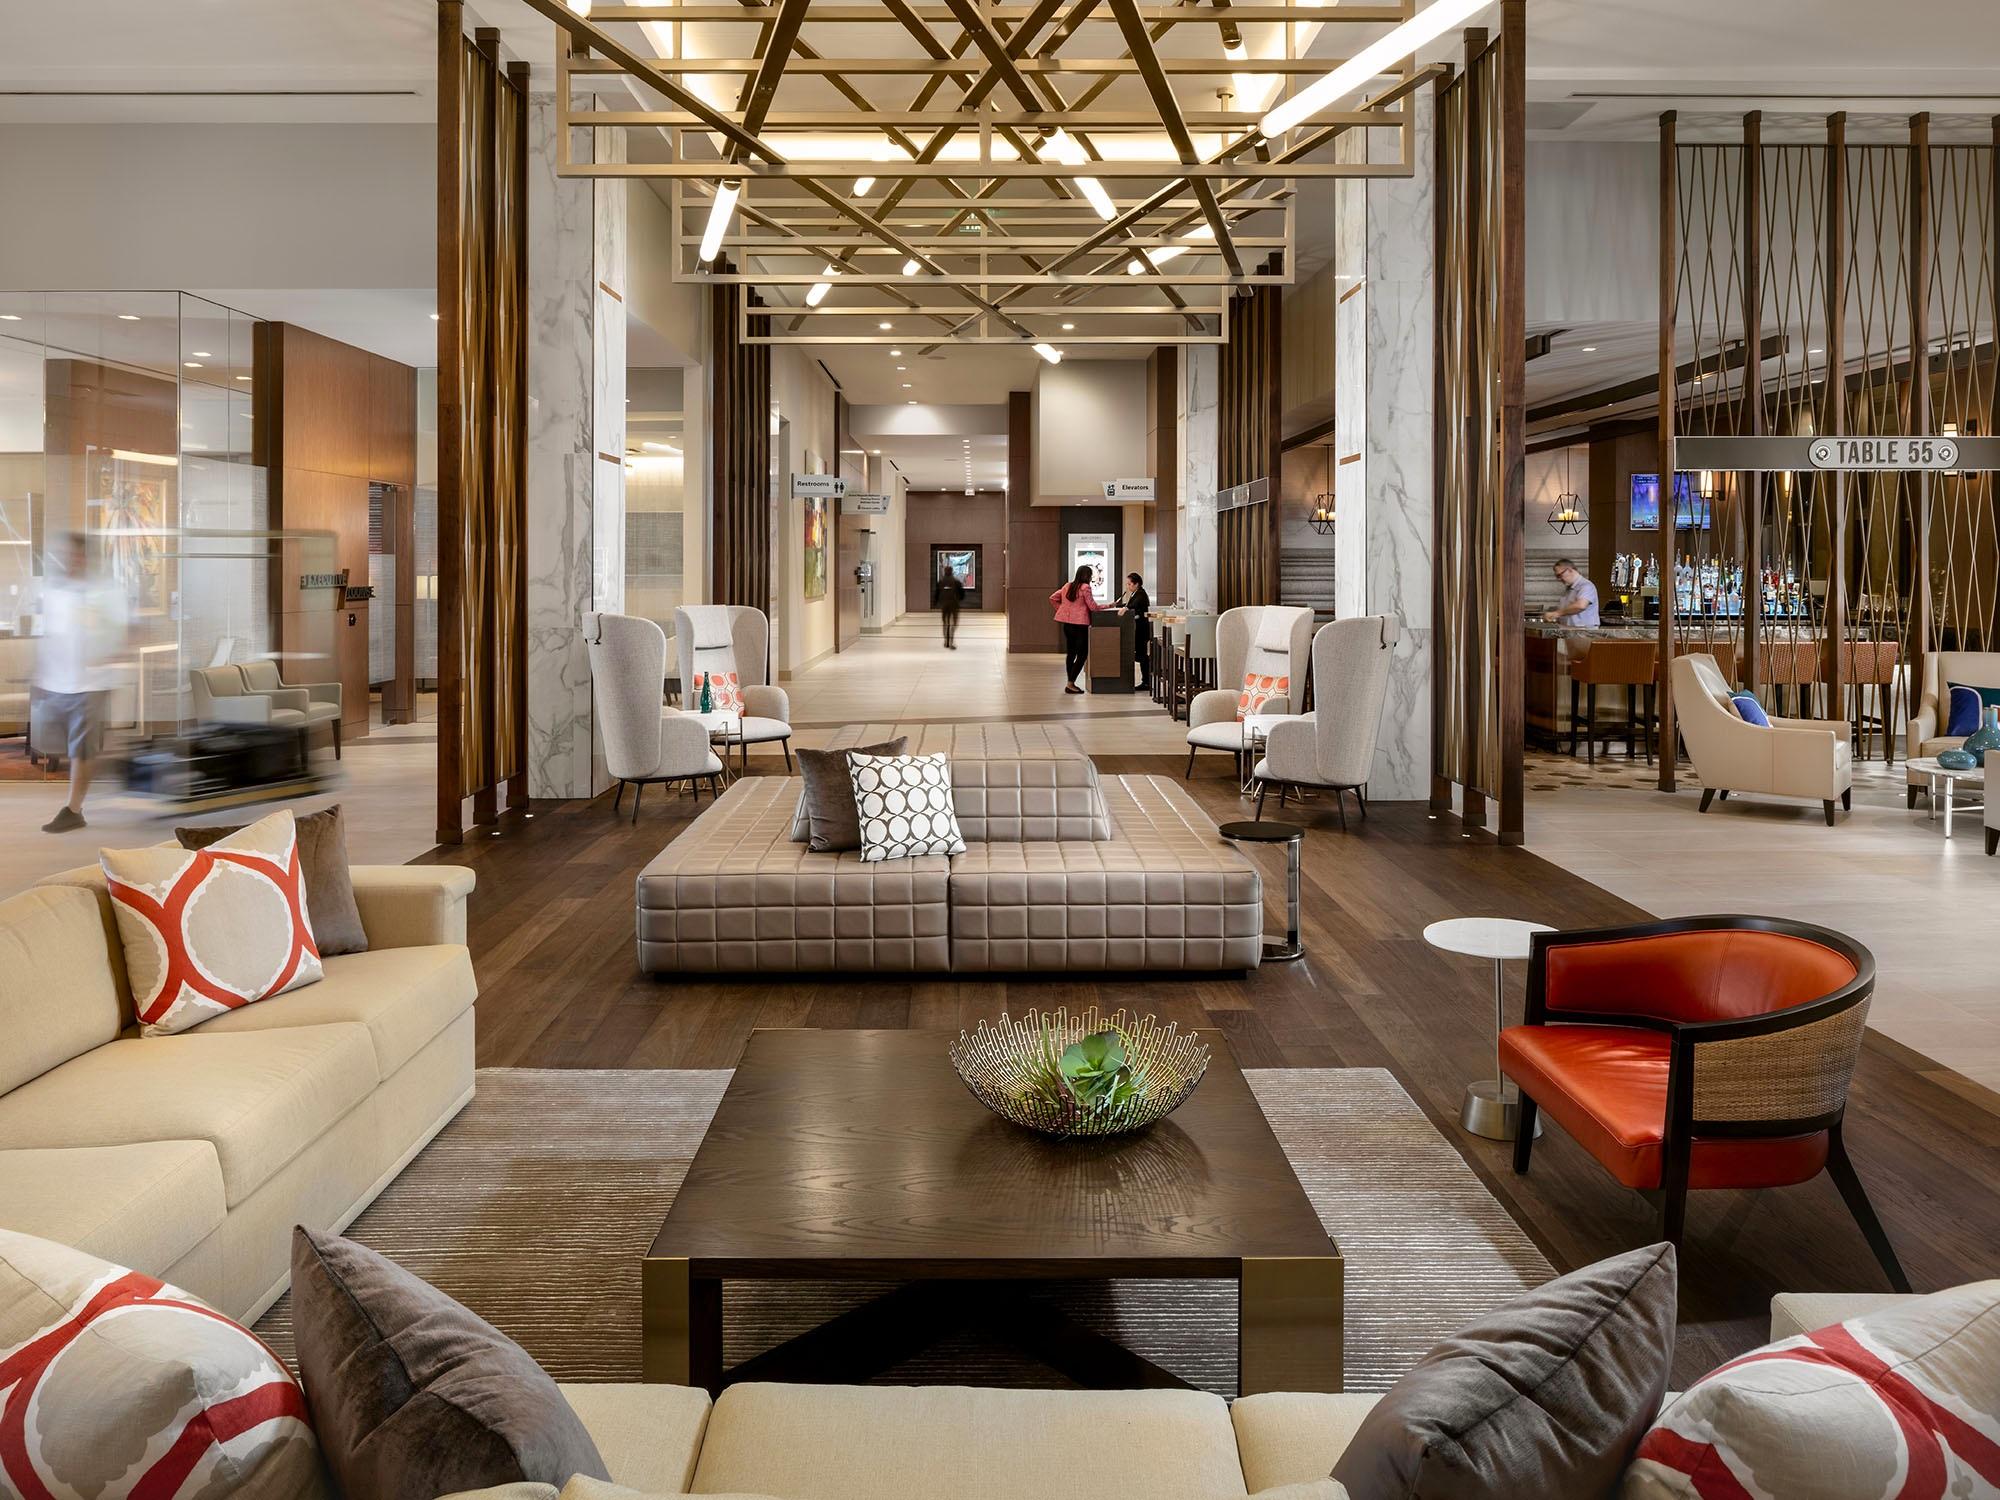 Hilton+Miami+Dadeland+Hospitality+Furniture+Design+_0004_RTKL_050819_9123.jpg